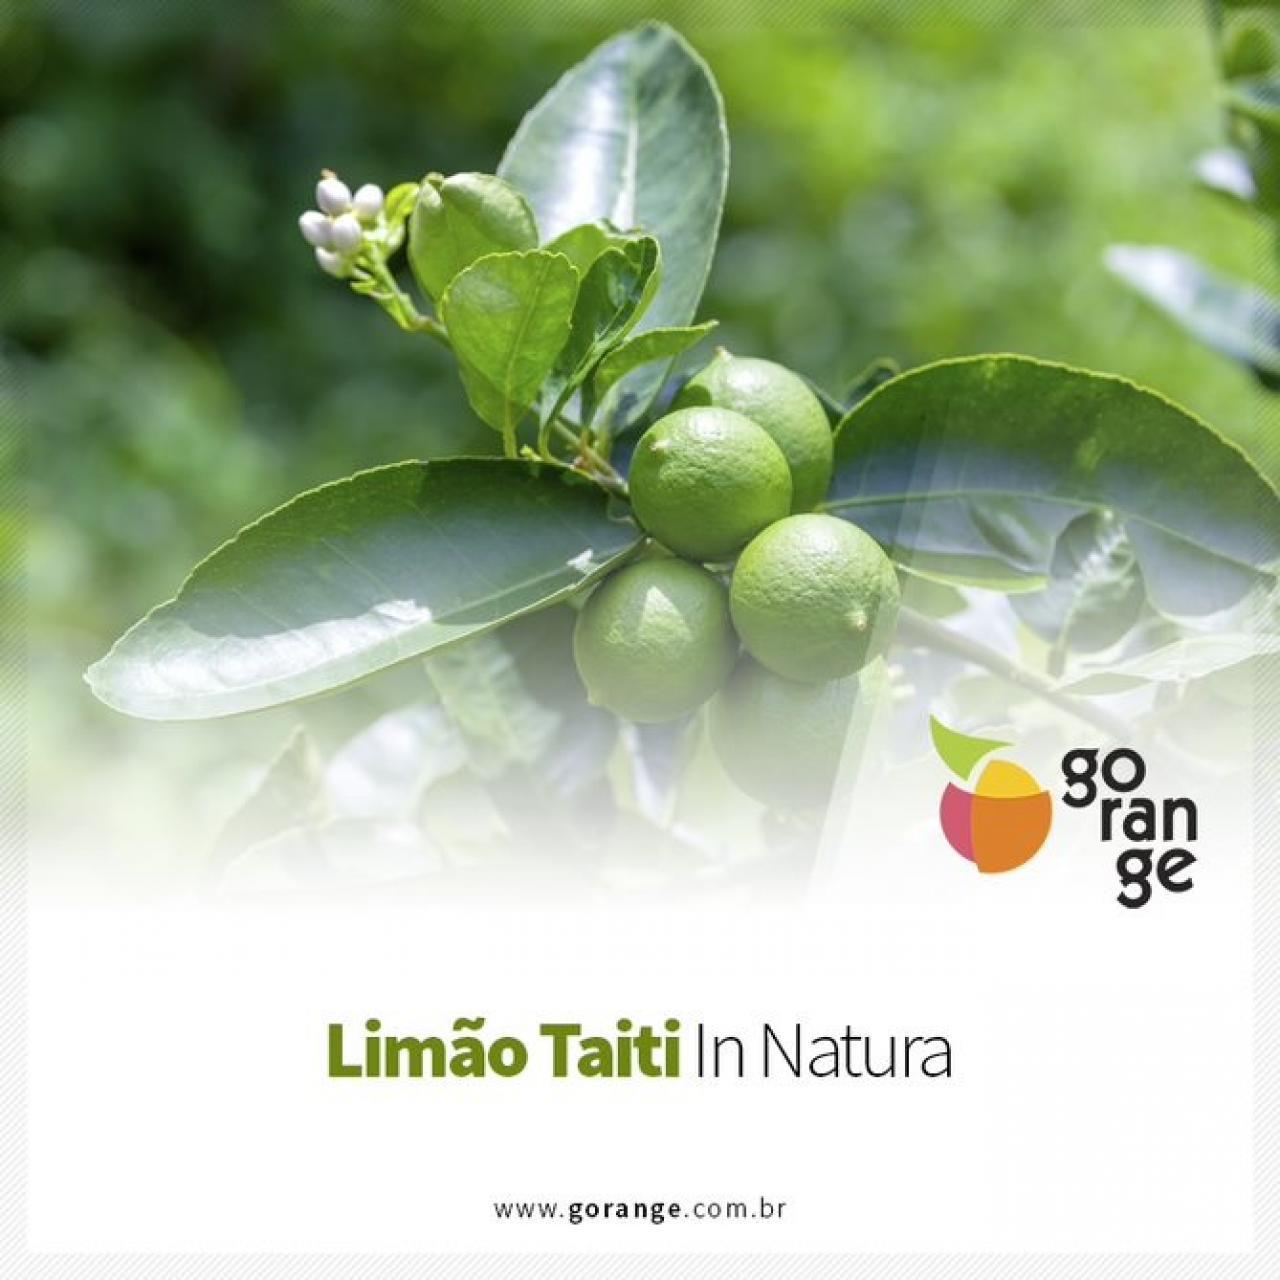 Limão Taiti in Natura